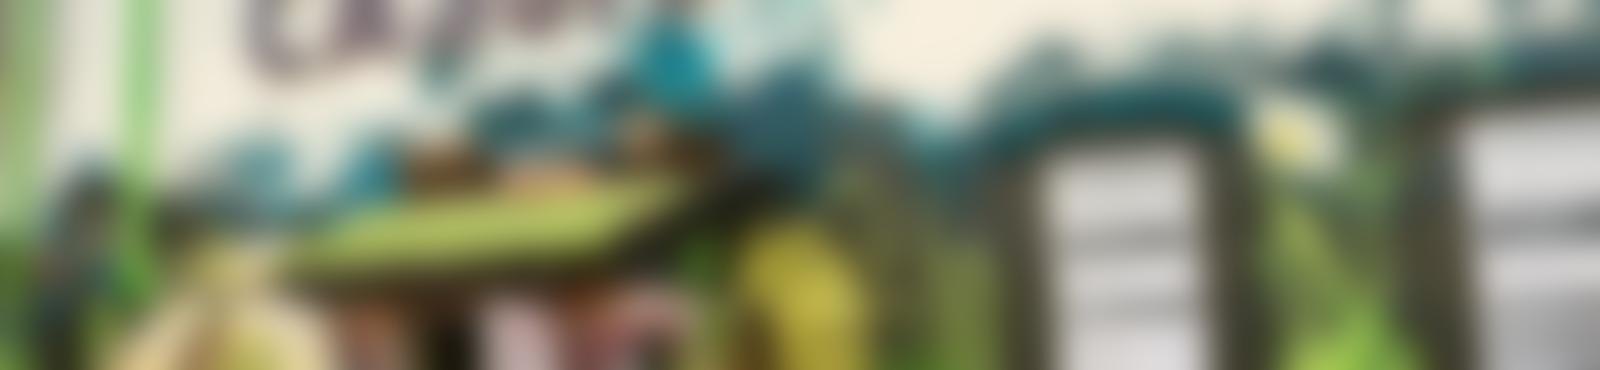 Blurred fe83f795 251d 4122 b489 ab2c7295da08